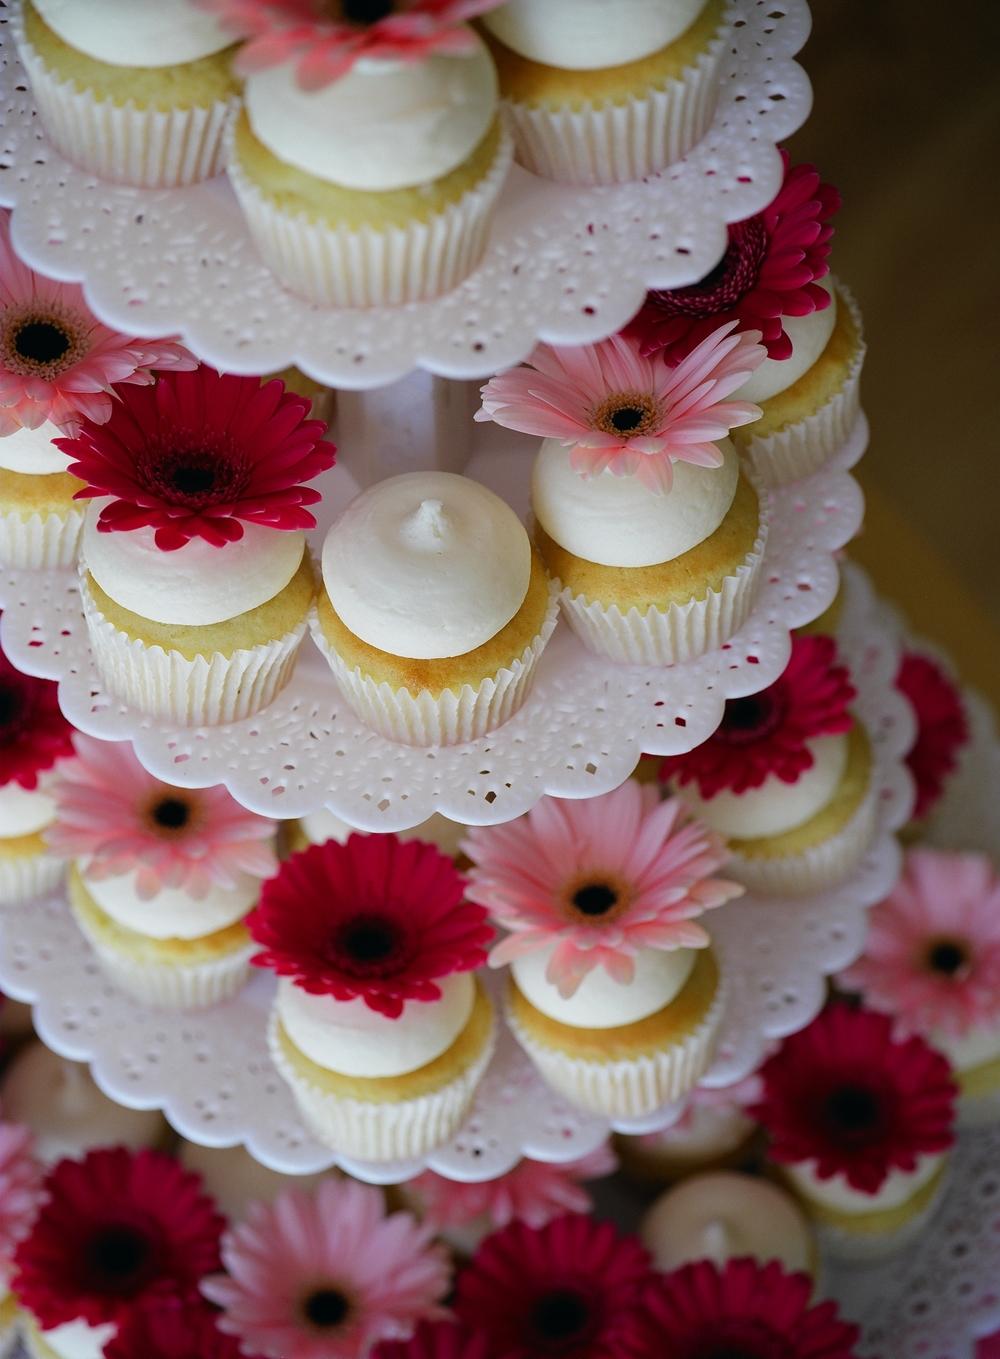 SommersetDesign_Work_LulusIdentity_cupcakes.JPG